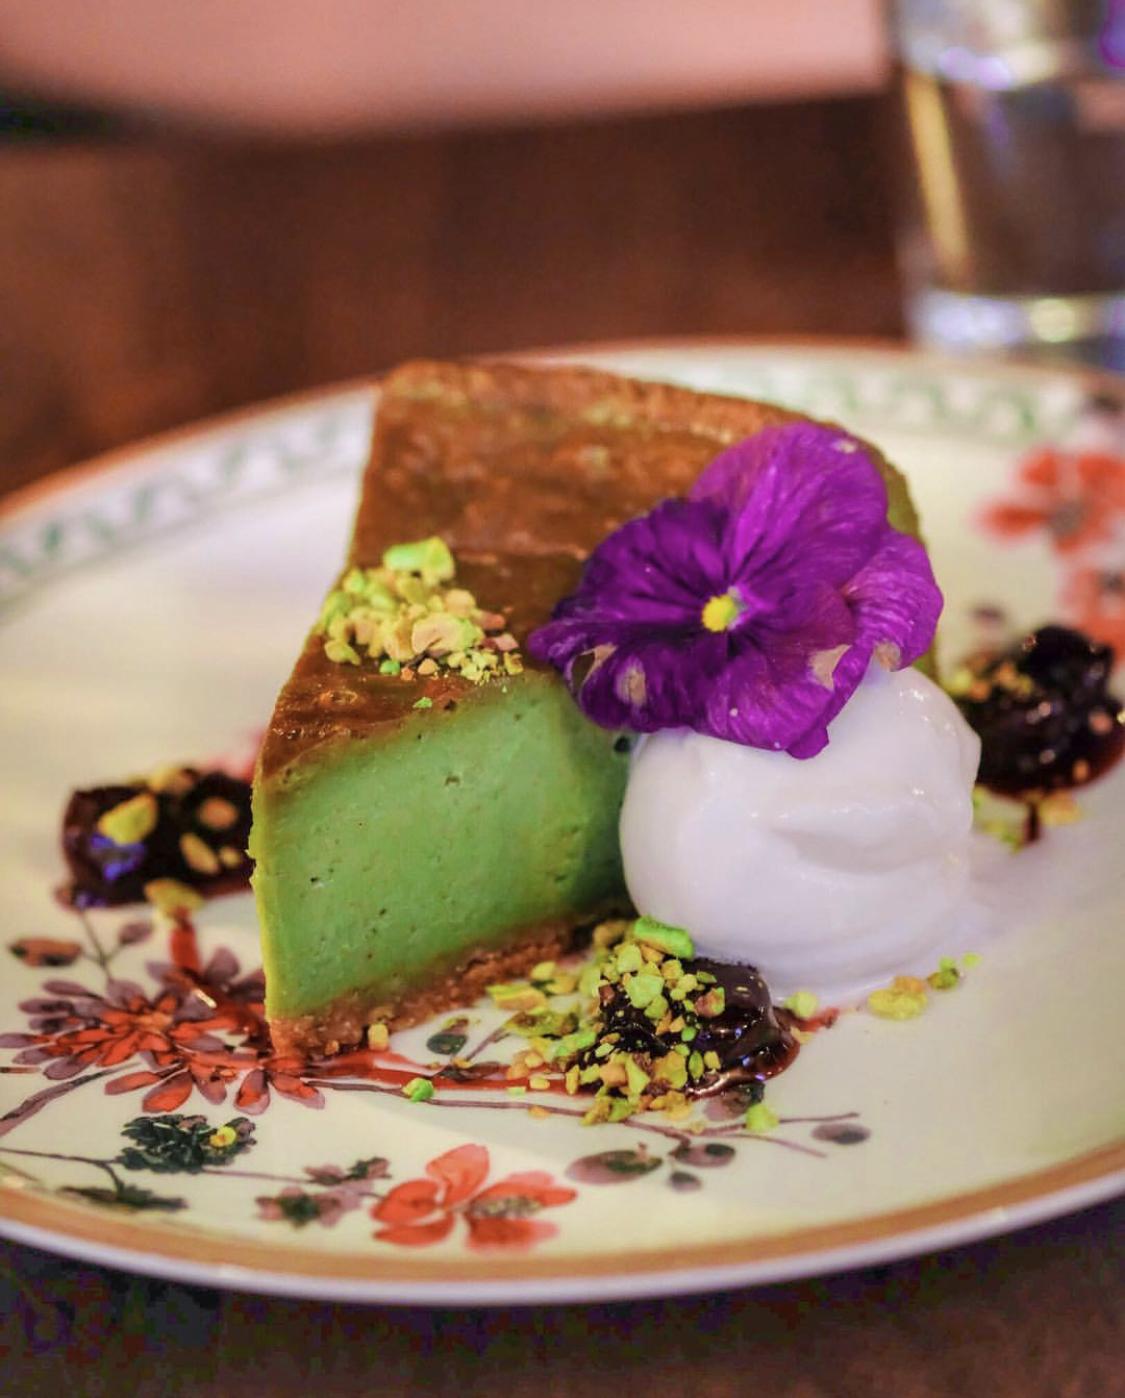 Vegan pistachio cheesecake